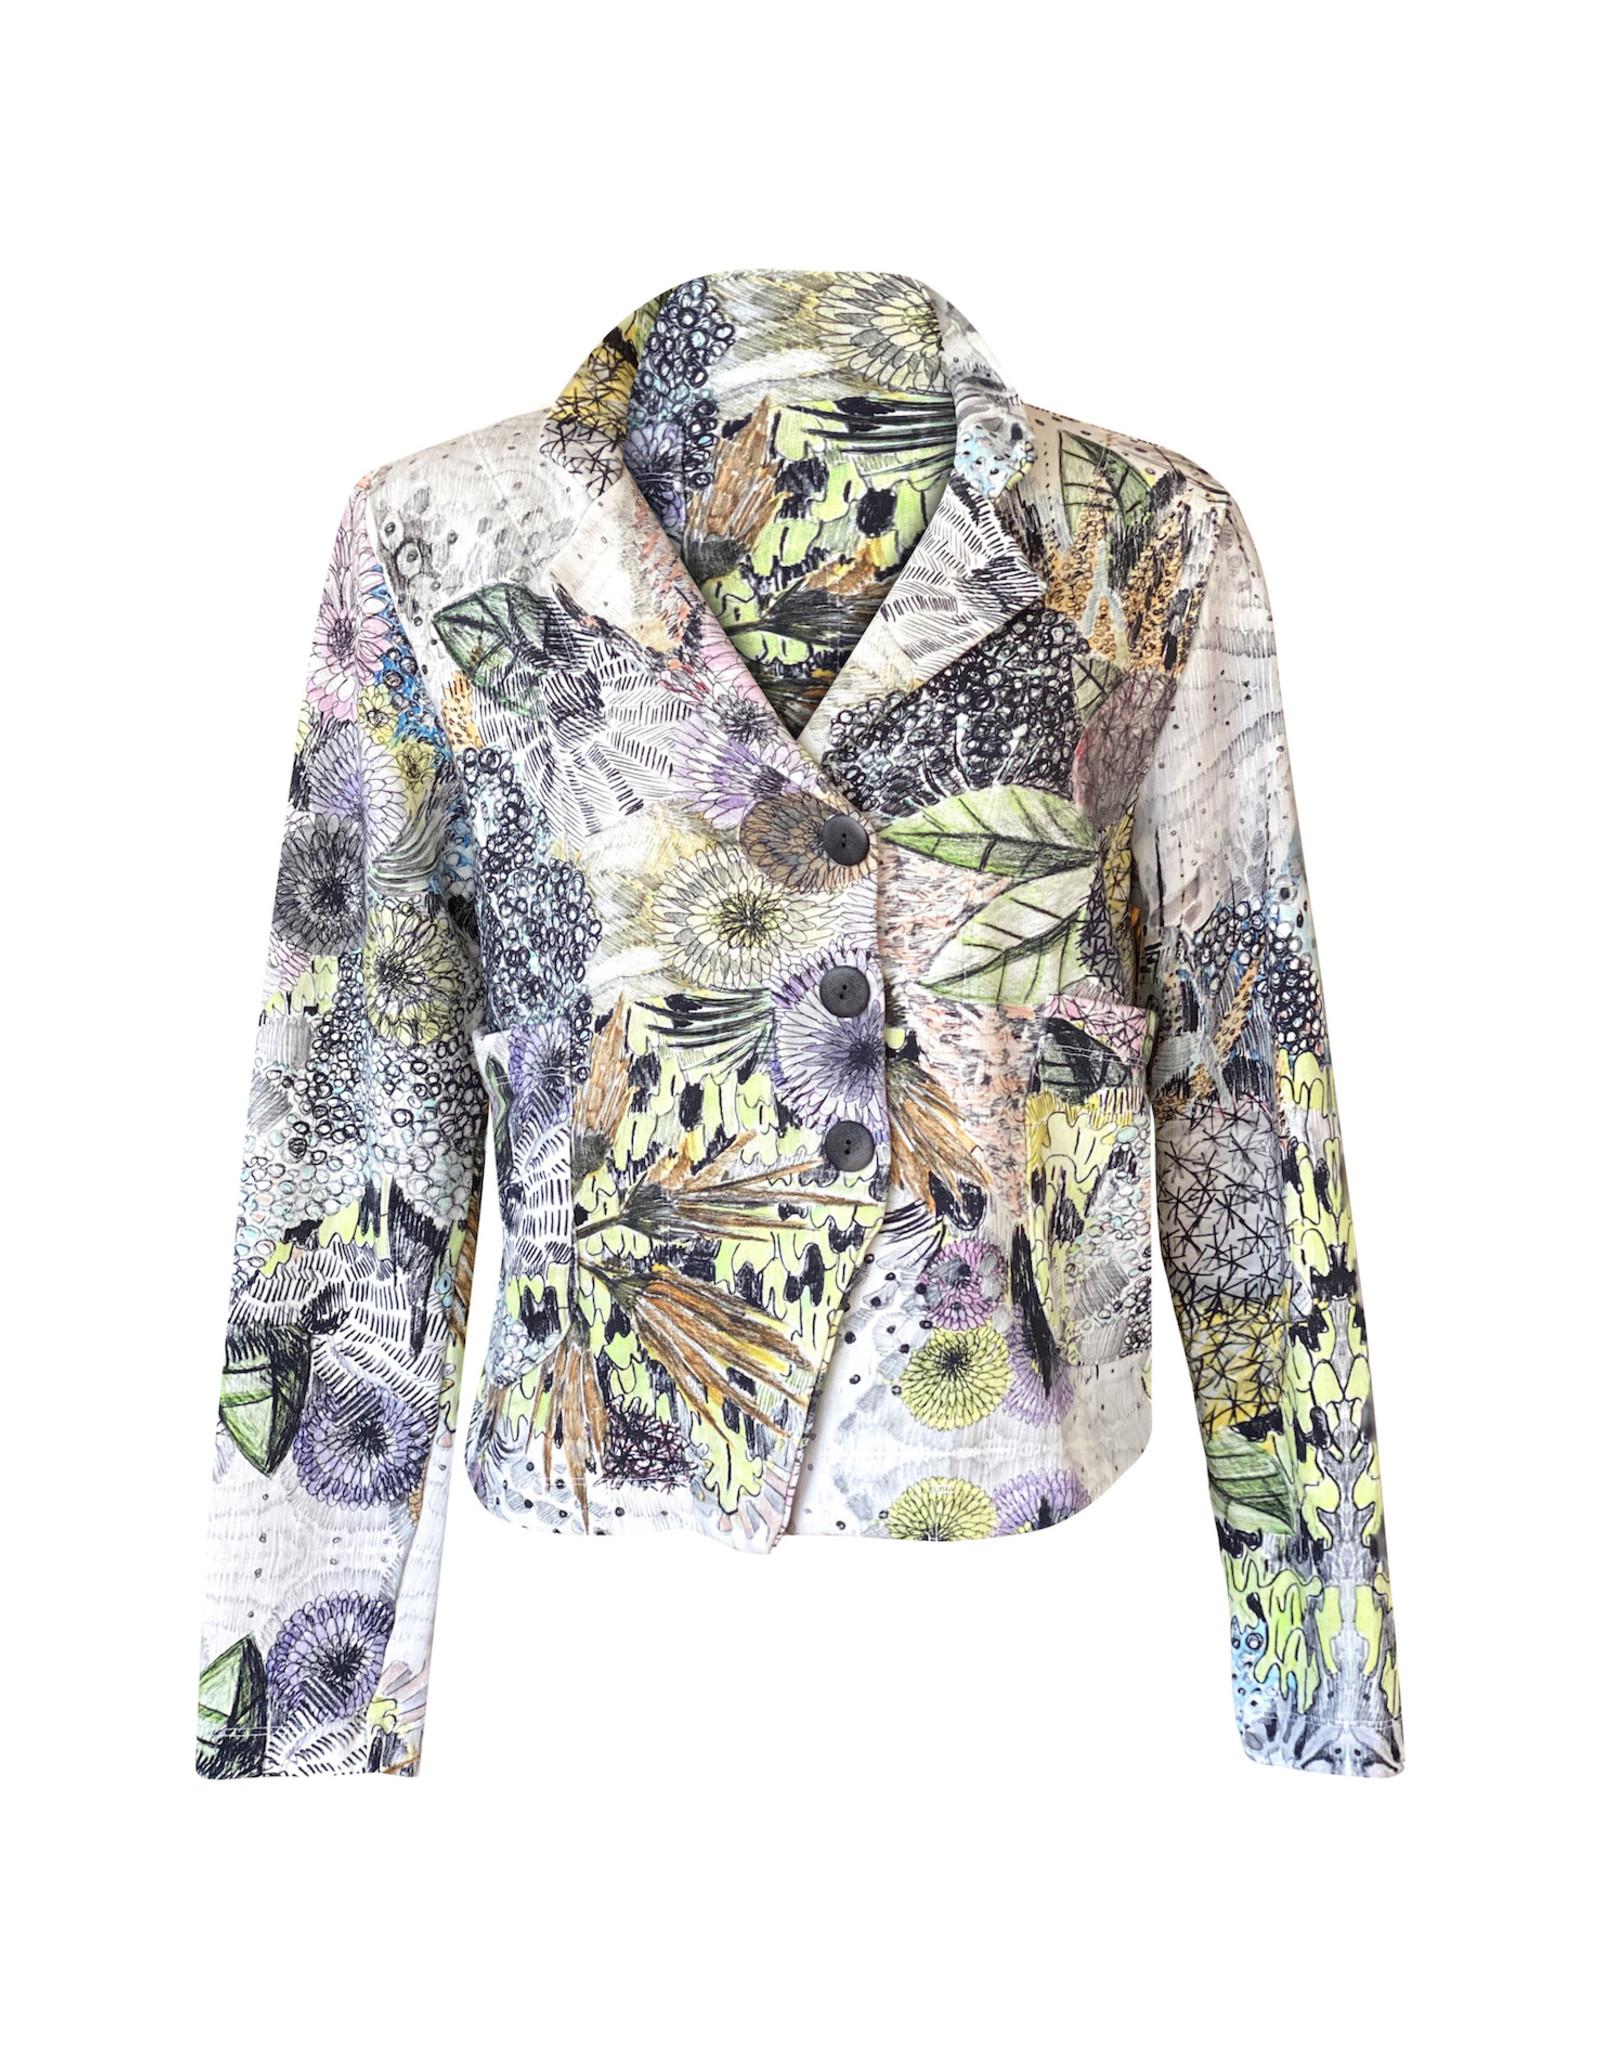 Grizas Grizas-Crop Jacket in Print